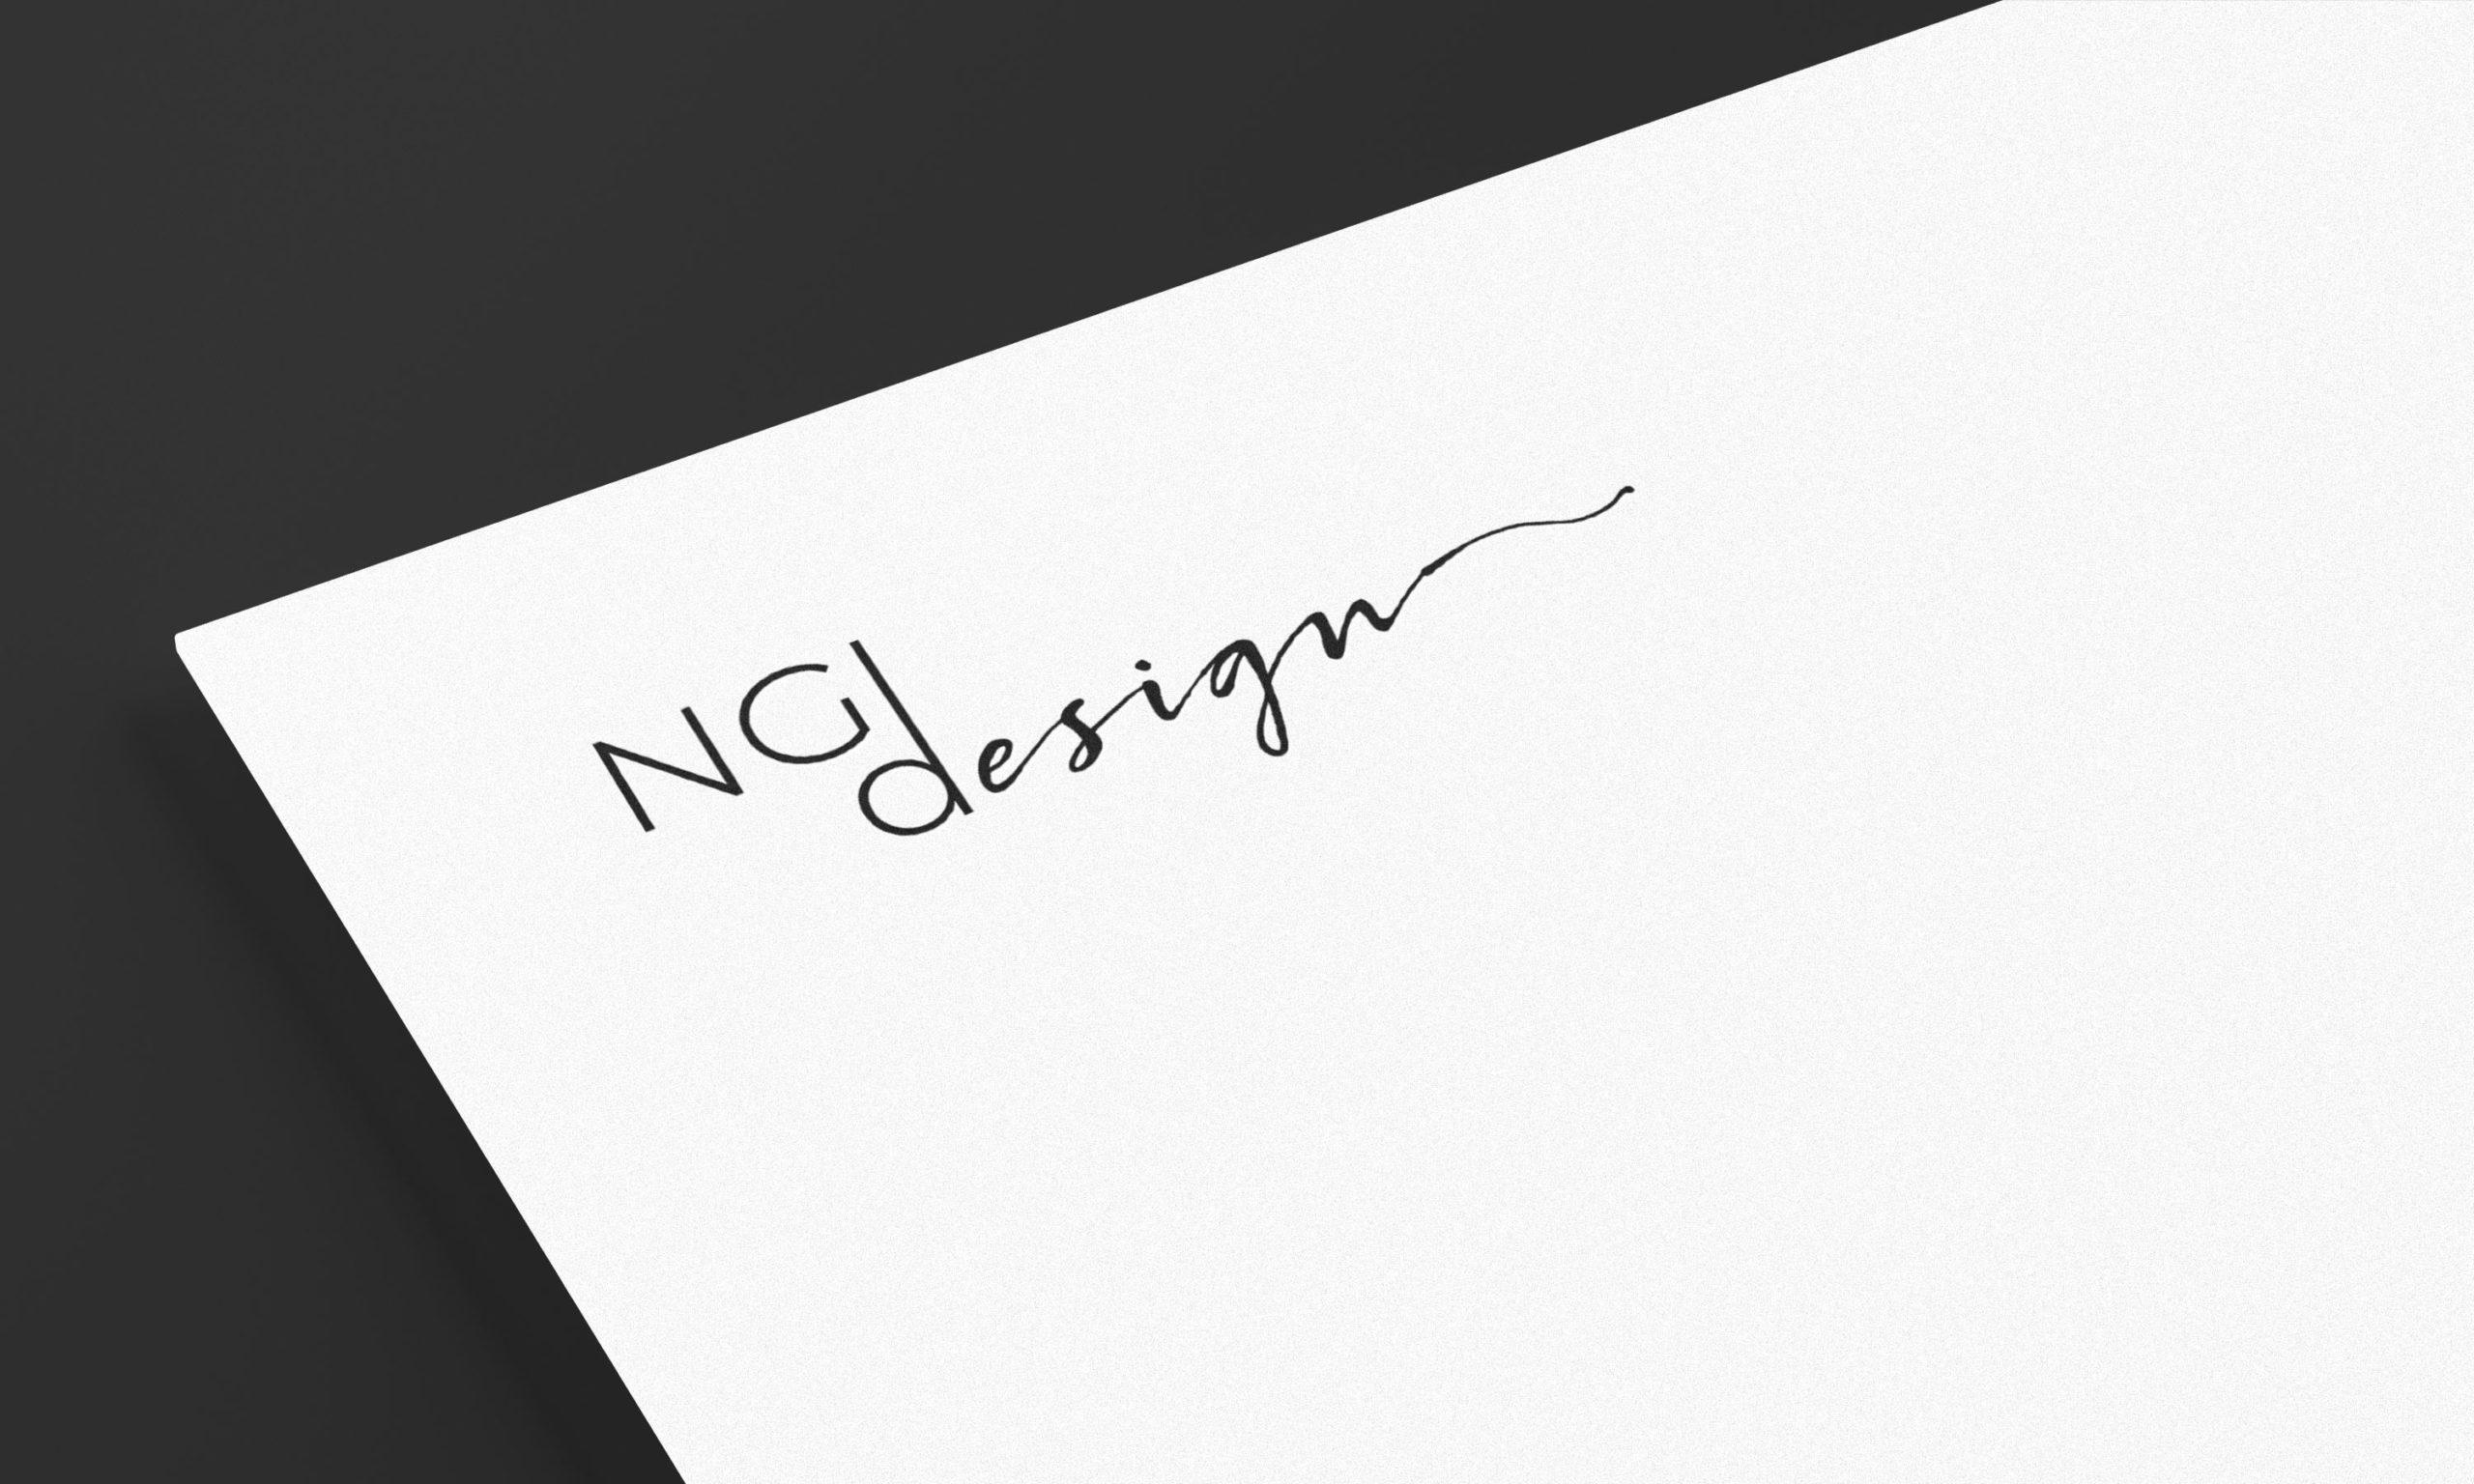 Logotype NGDesign, graphiste et concepteur web